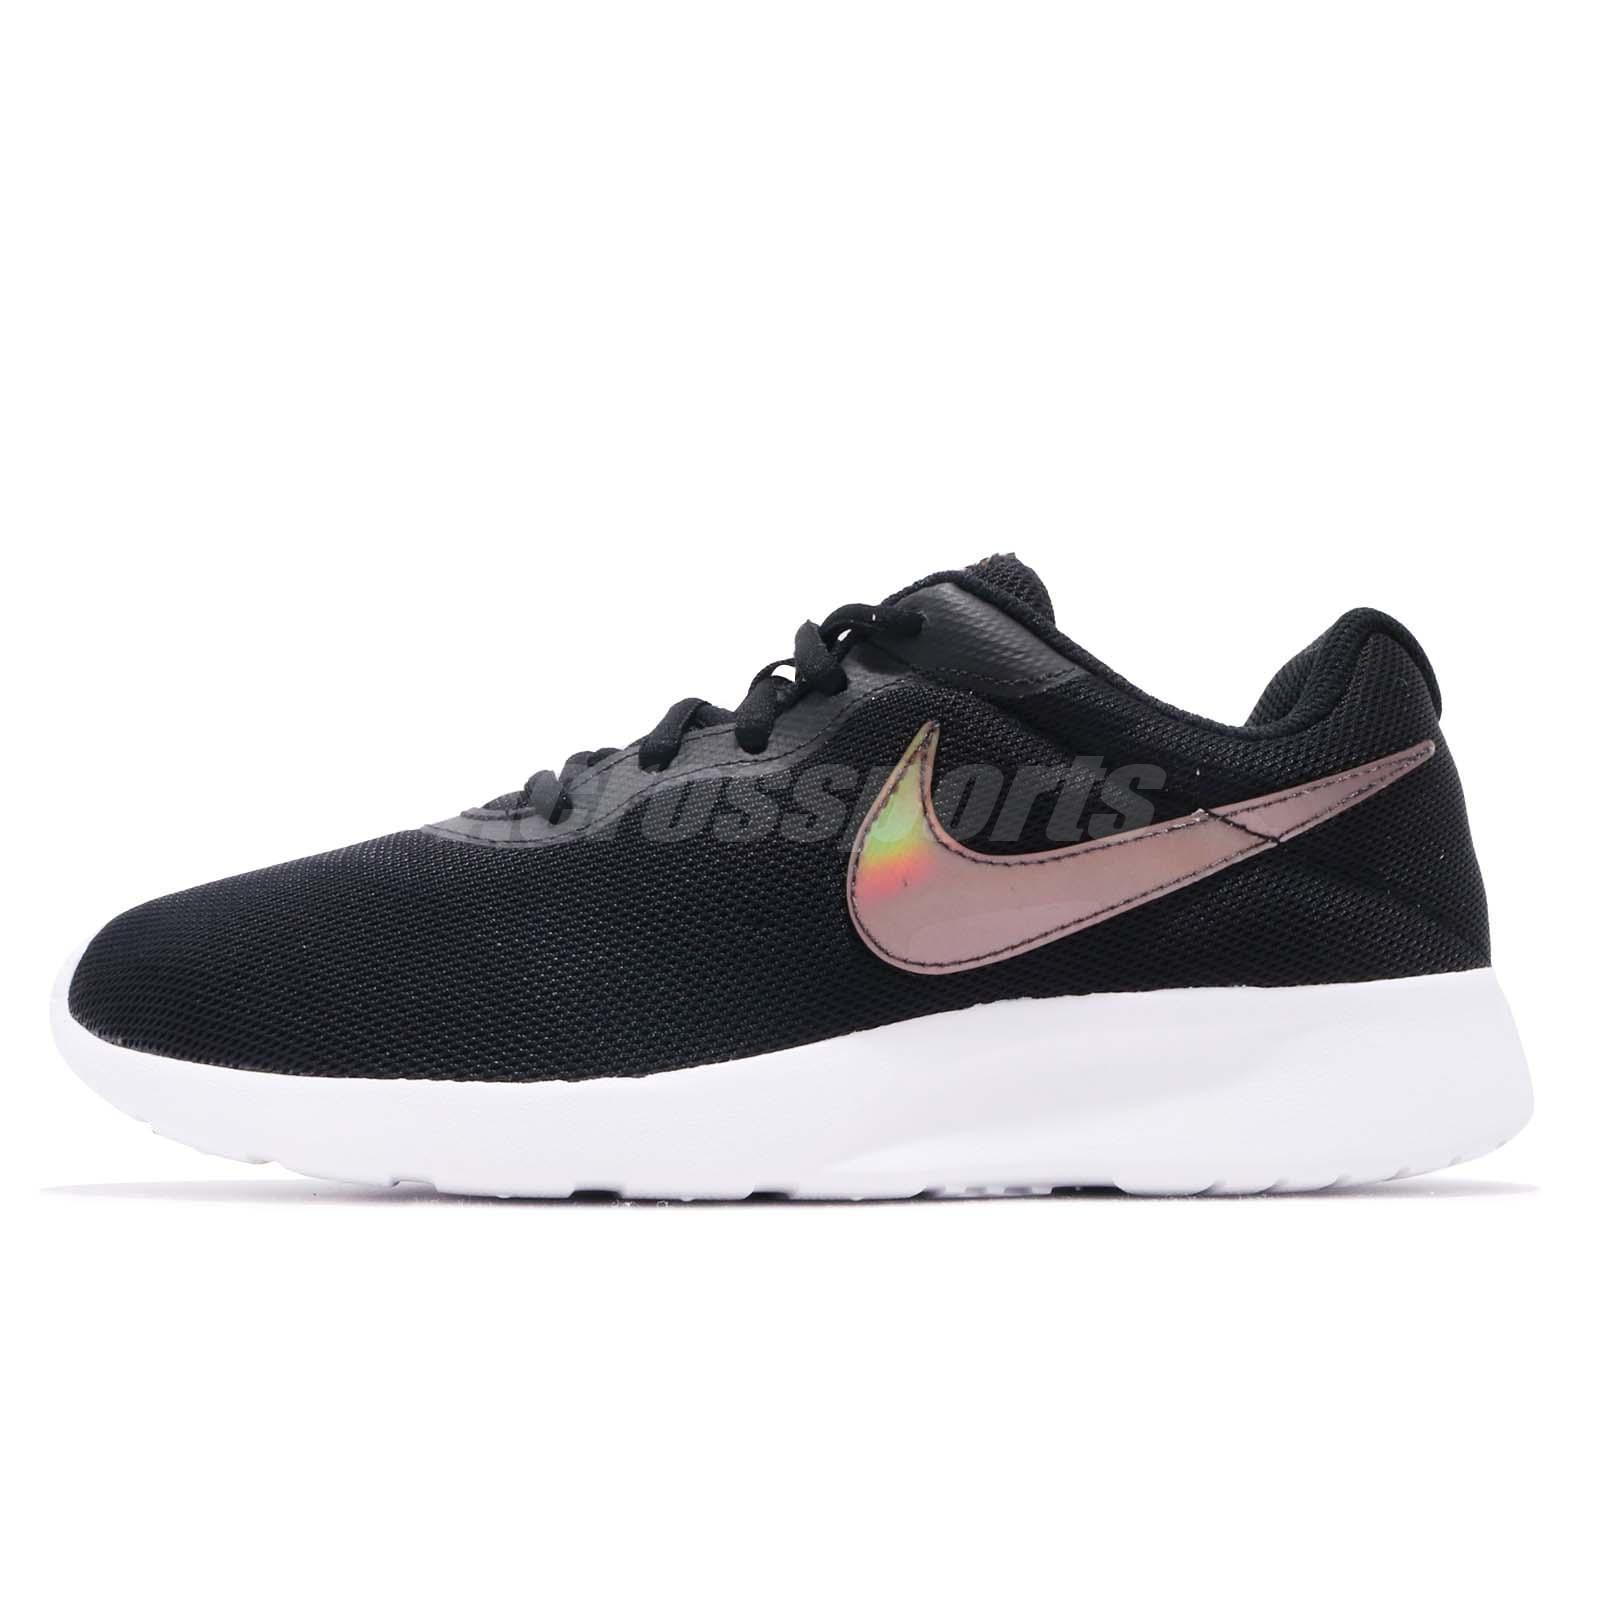 wholesale dealer 42d3e c2199 Damenschuhe Black Nike Women Tanjun Premium SE Sneaker